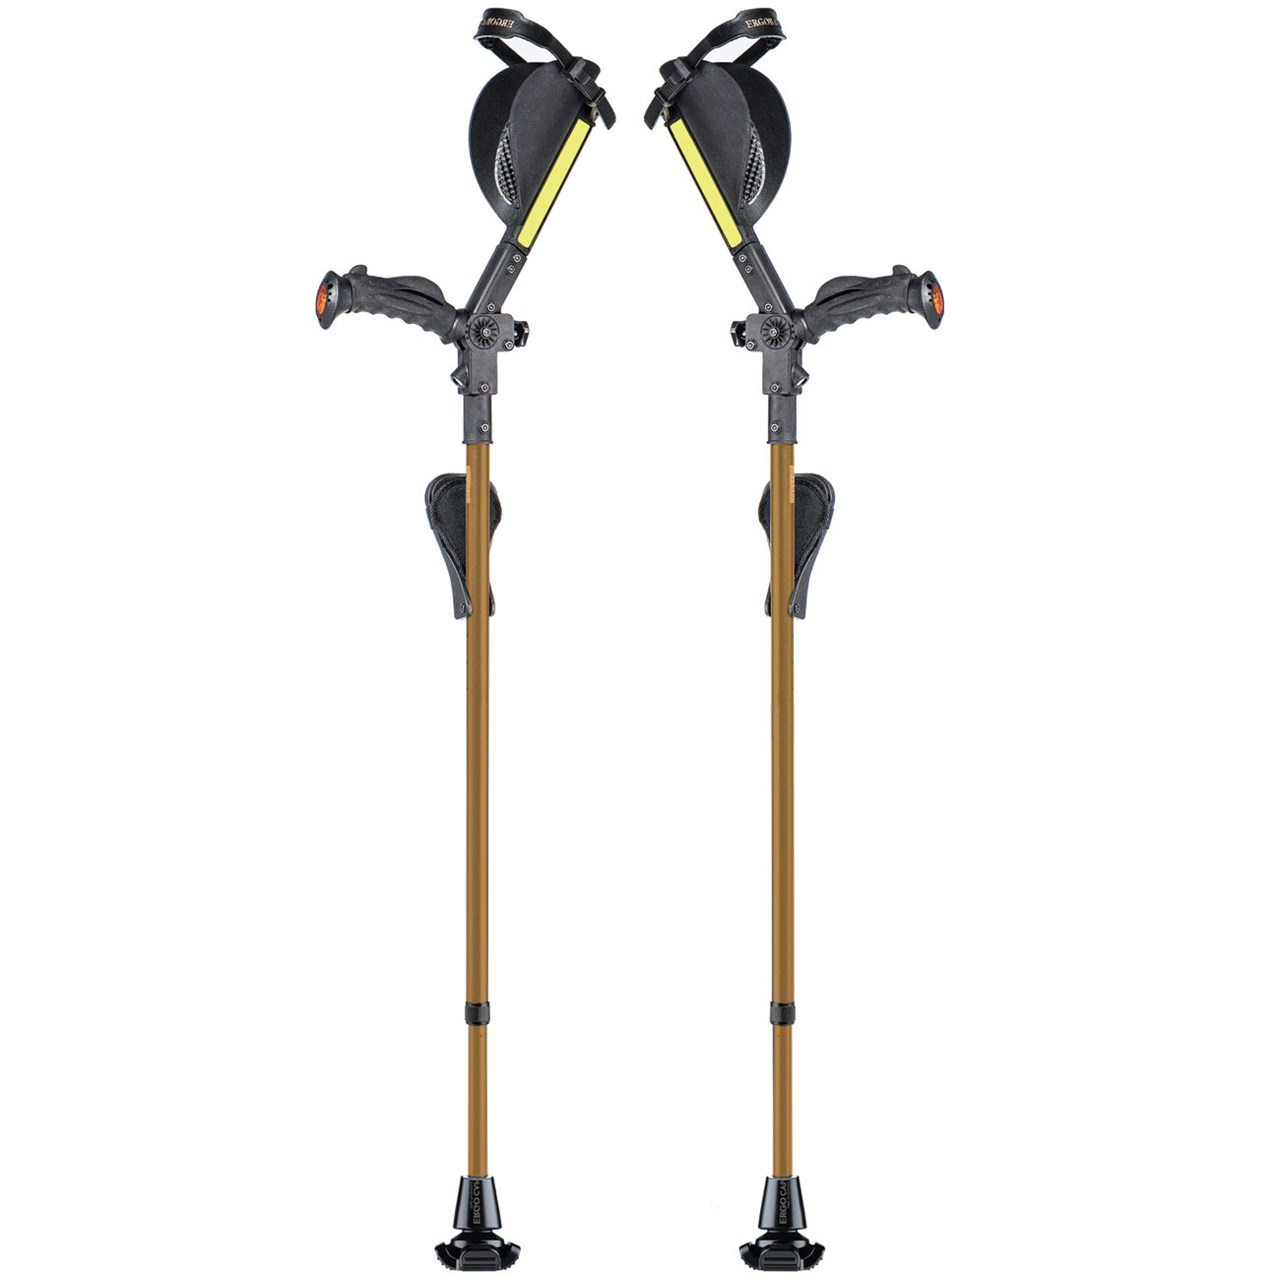 Ergobaum Ergonomic Forearm Crutches - Adult - Gold-Tone